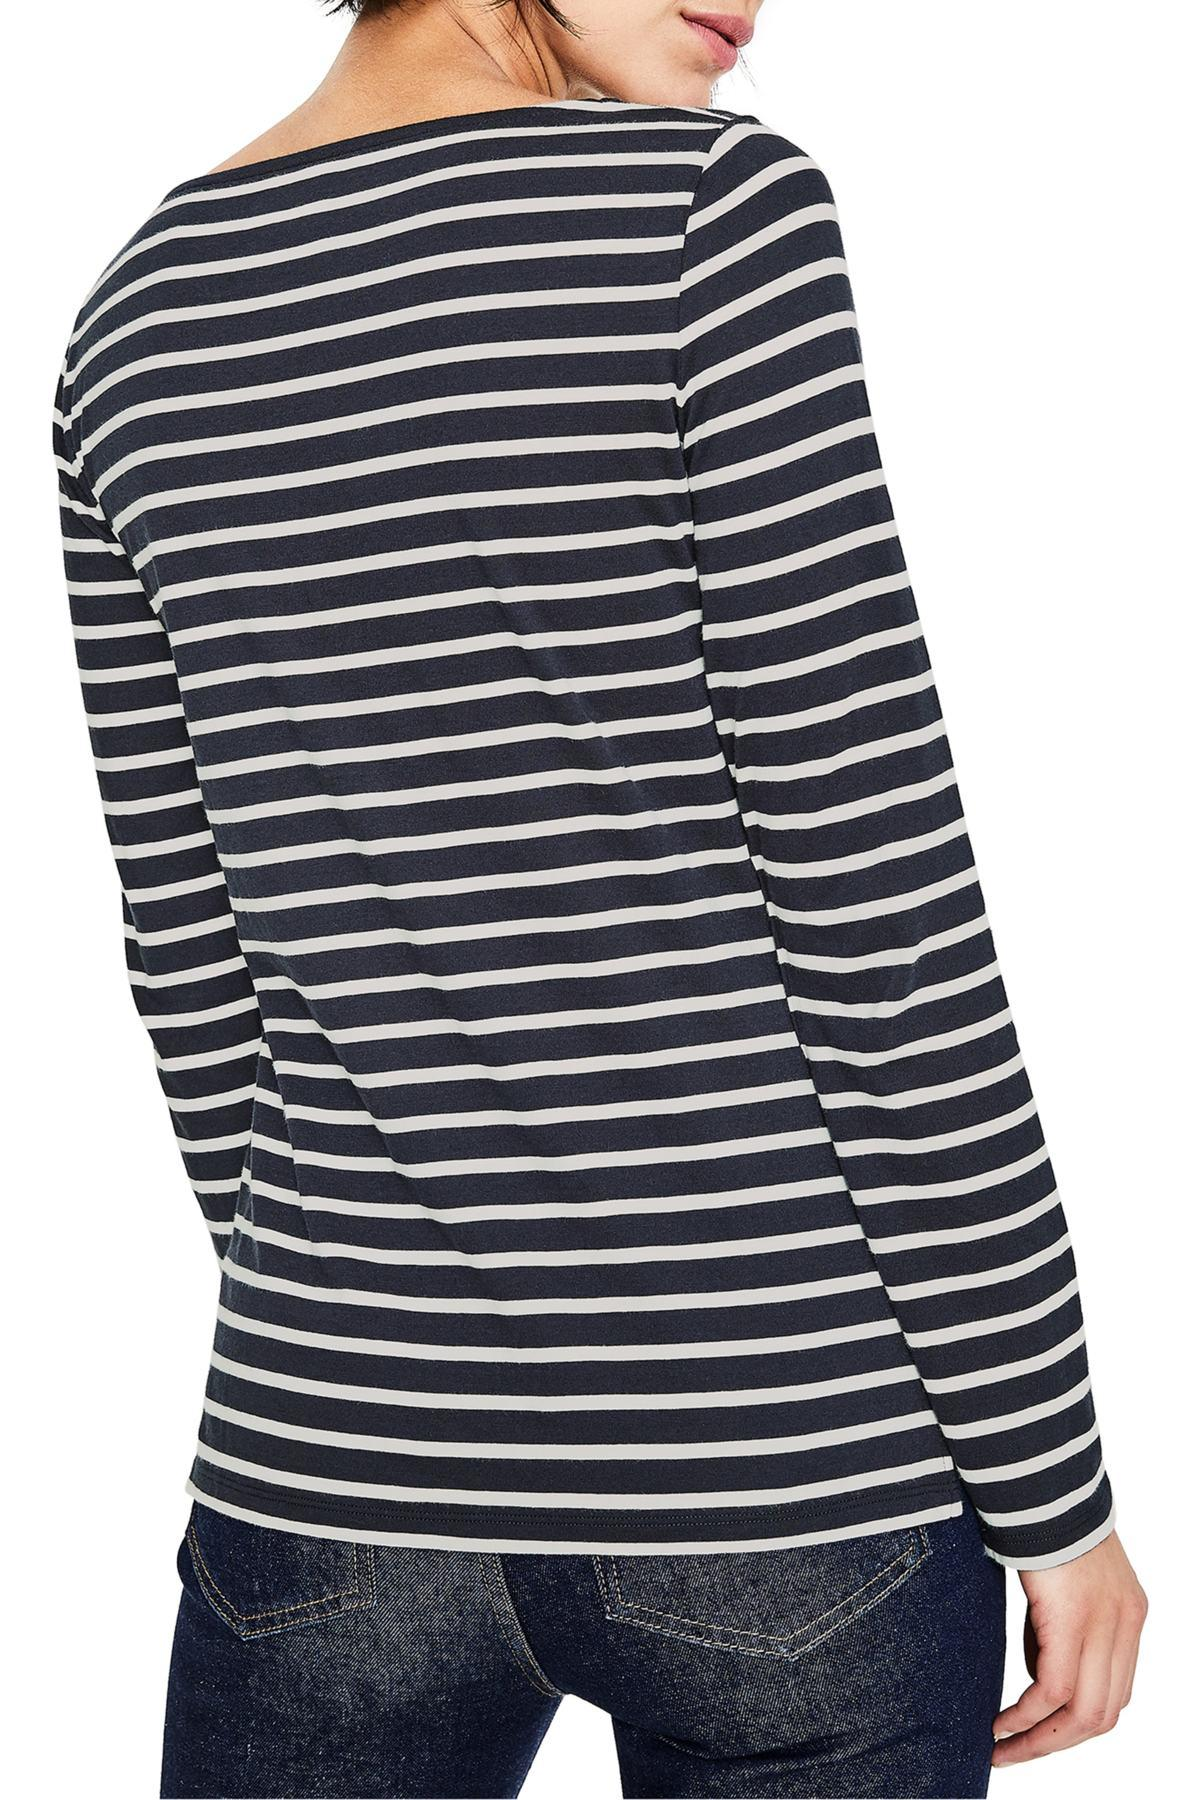 3b735042d6 Boden - Blue The Fun Breton Stripe Top - Lyst. View fullscreen